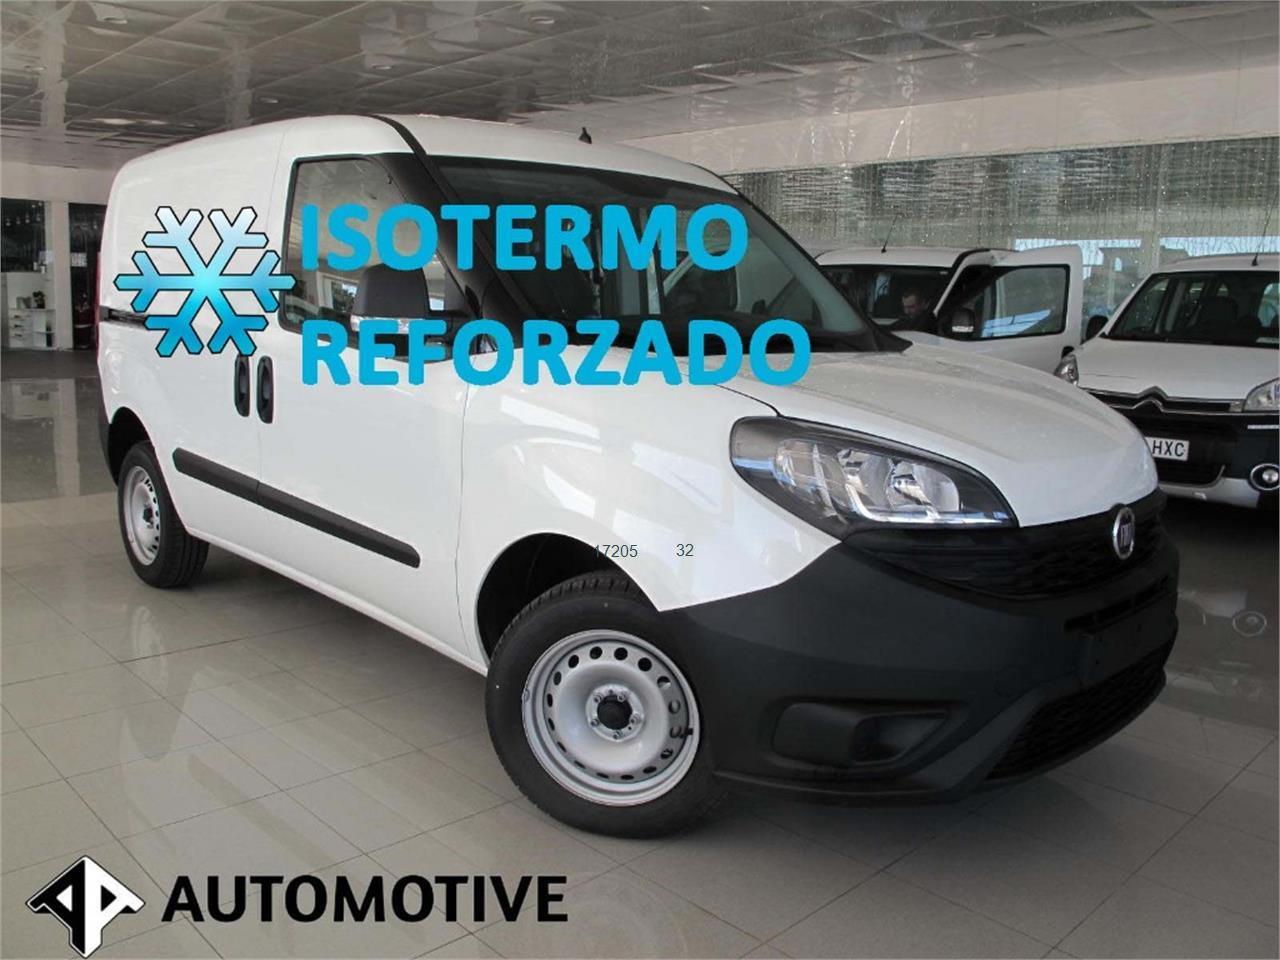 FIAT DOBLÓ CARGO 1.3 MJT ISOTERMO VENTA-RENTING de venta de venta por 13000